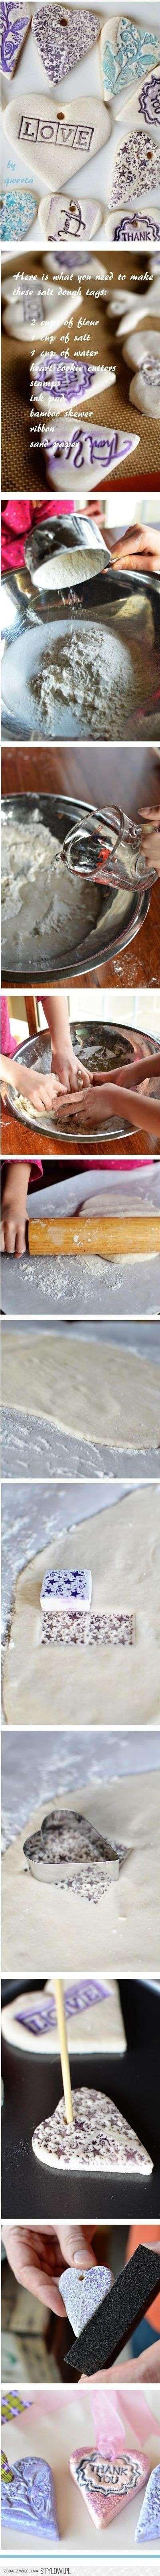 VALENTINES SALT DOUGH RECIPE & DIY